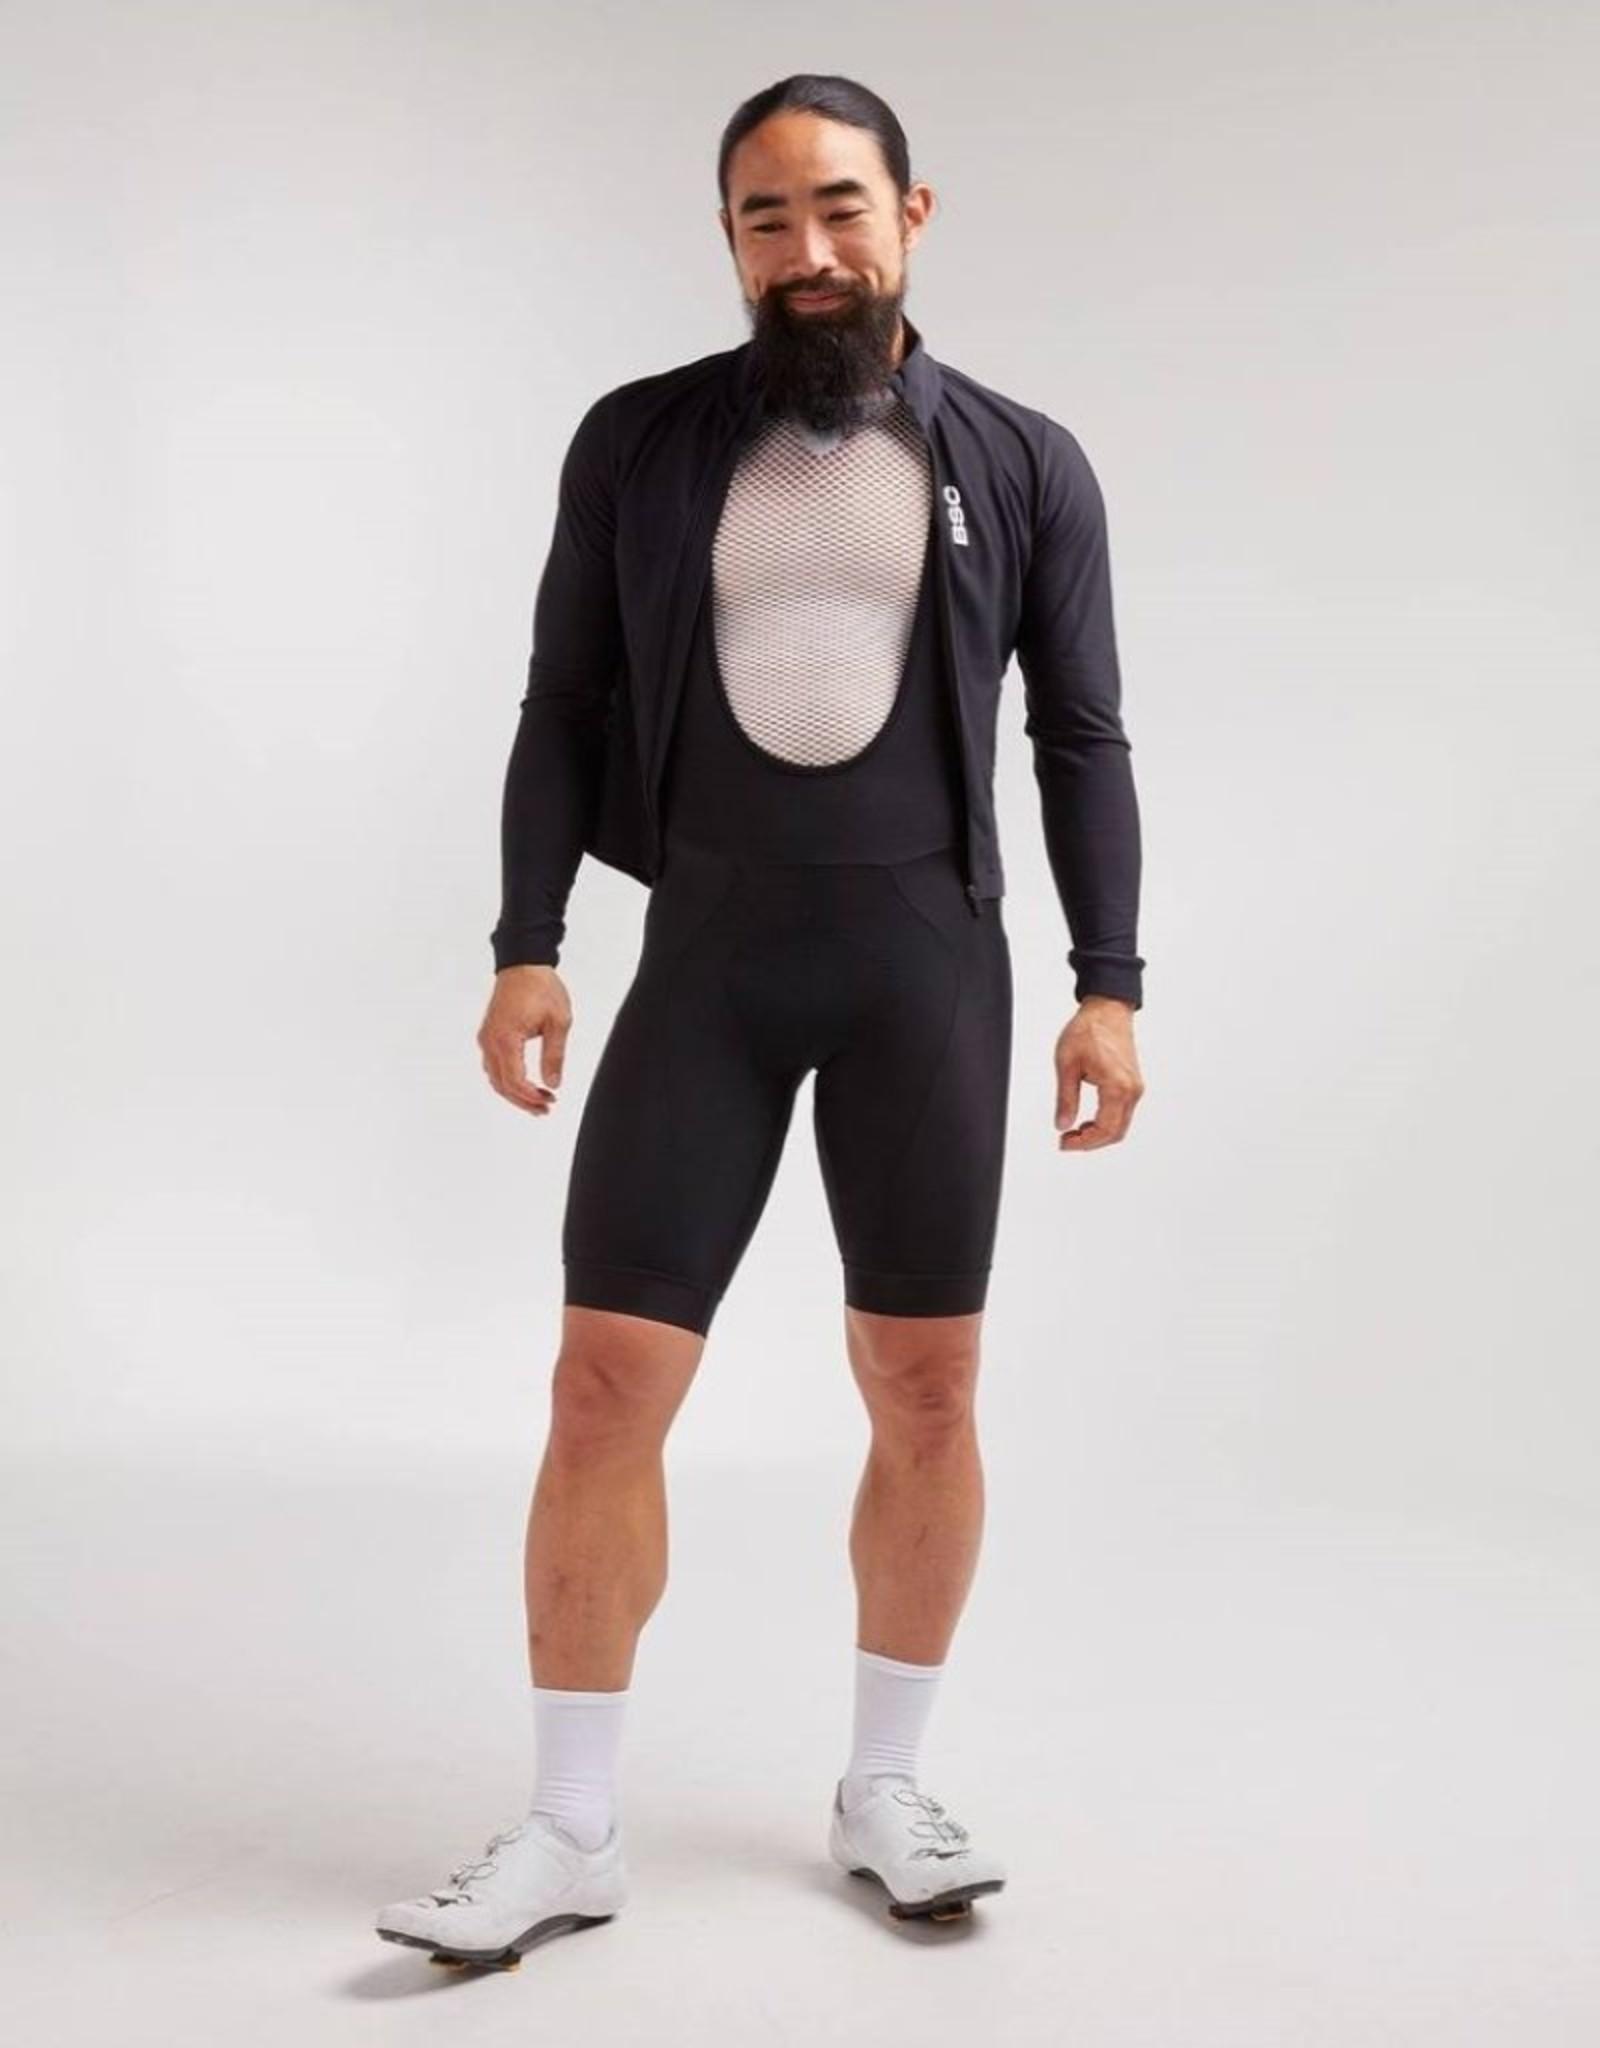 Black Sheep Cycling Men's Elements Thermische fietsjas - Black